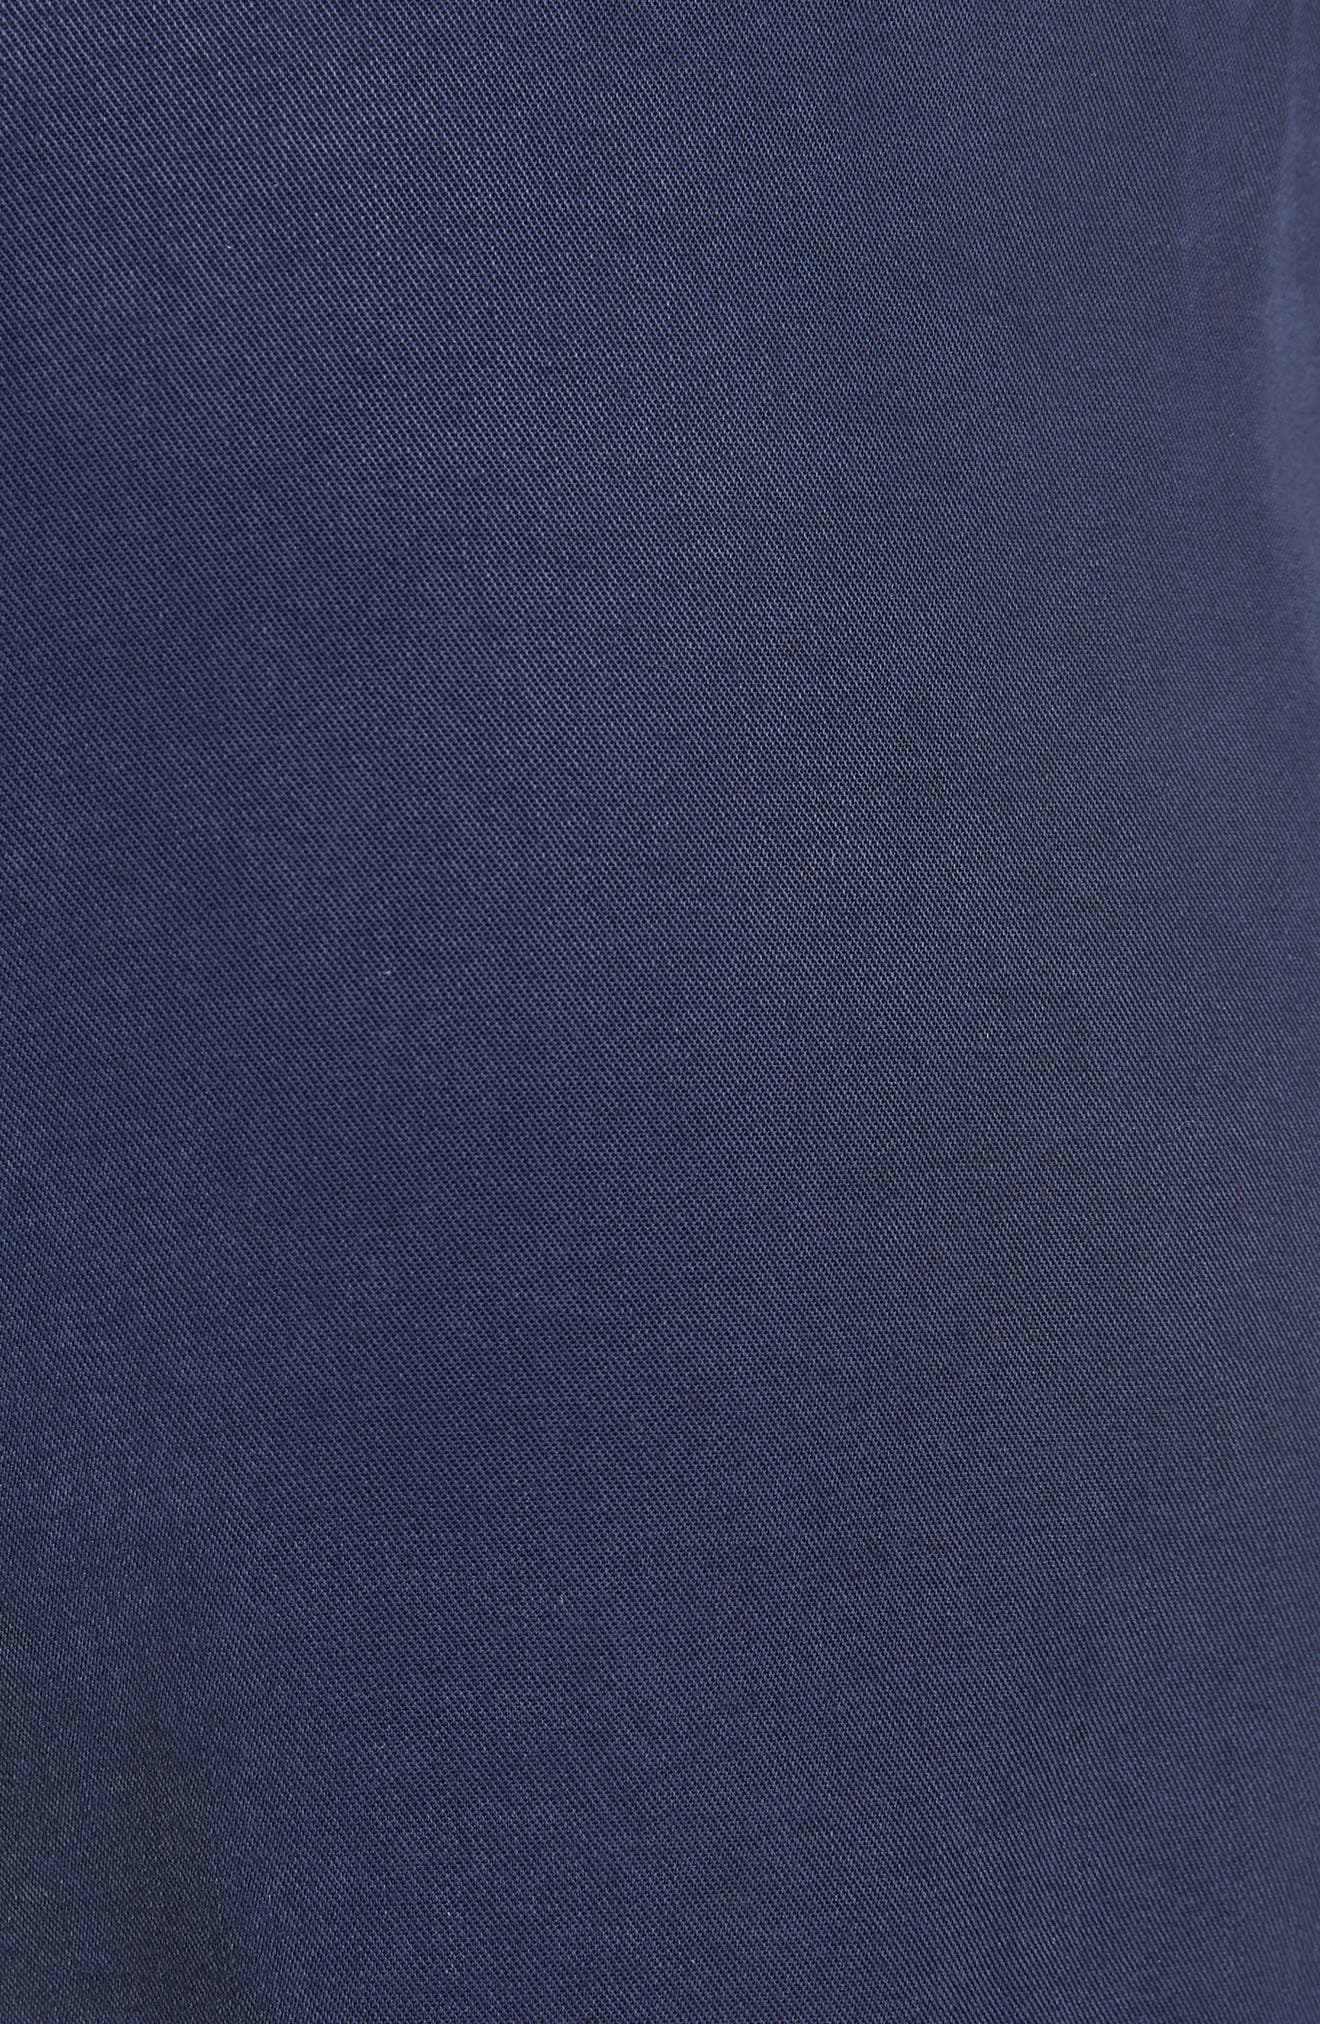 Beso Shorts,                             Alternate thumbnail 5, color,                             418